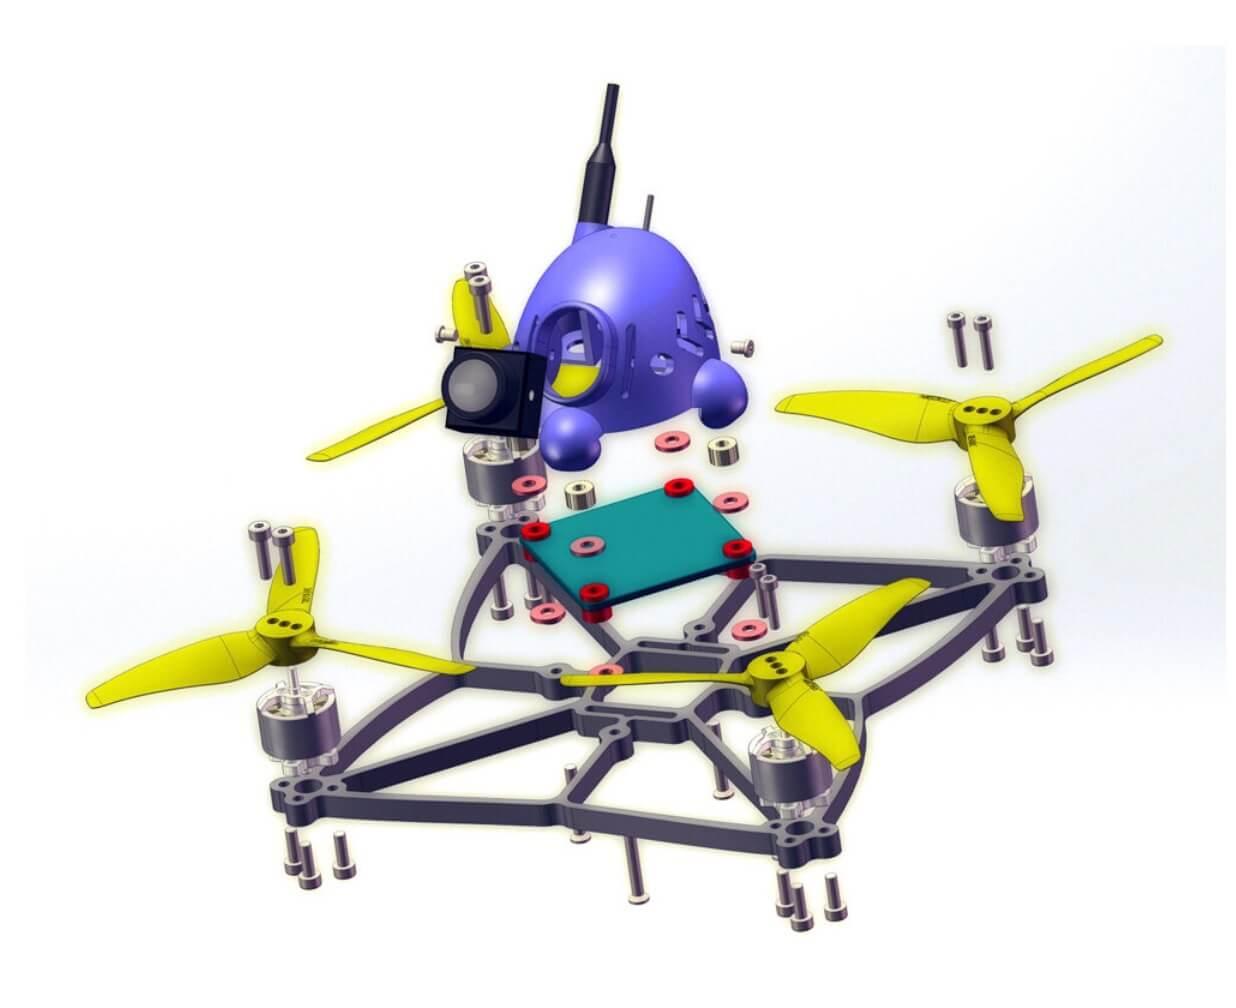 Stardrone Octopus 130mm おもしろいドローン発売